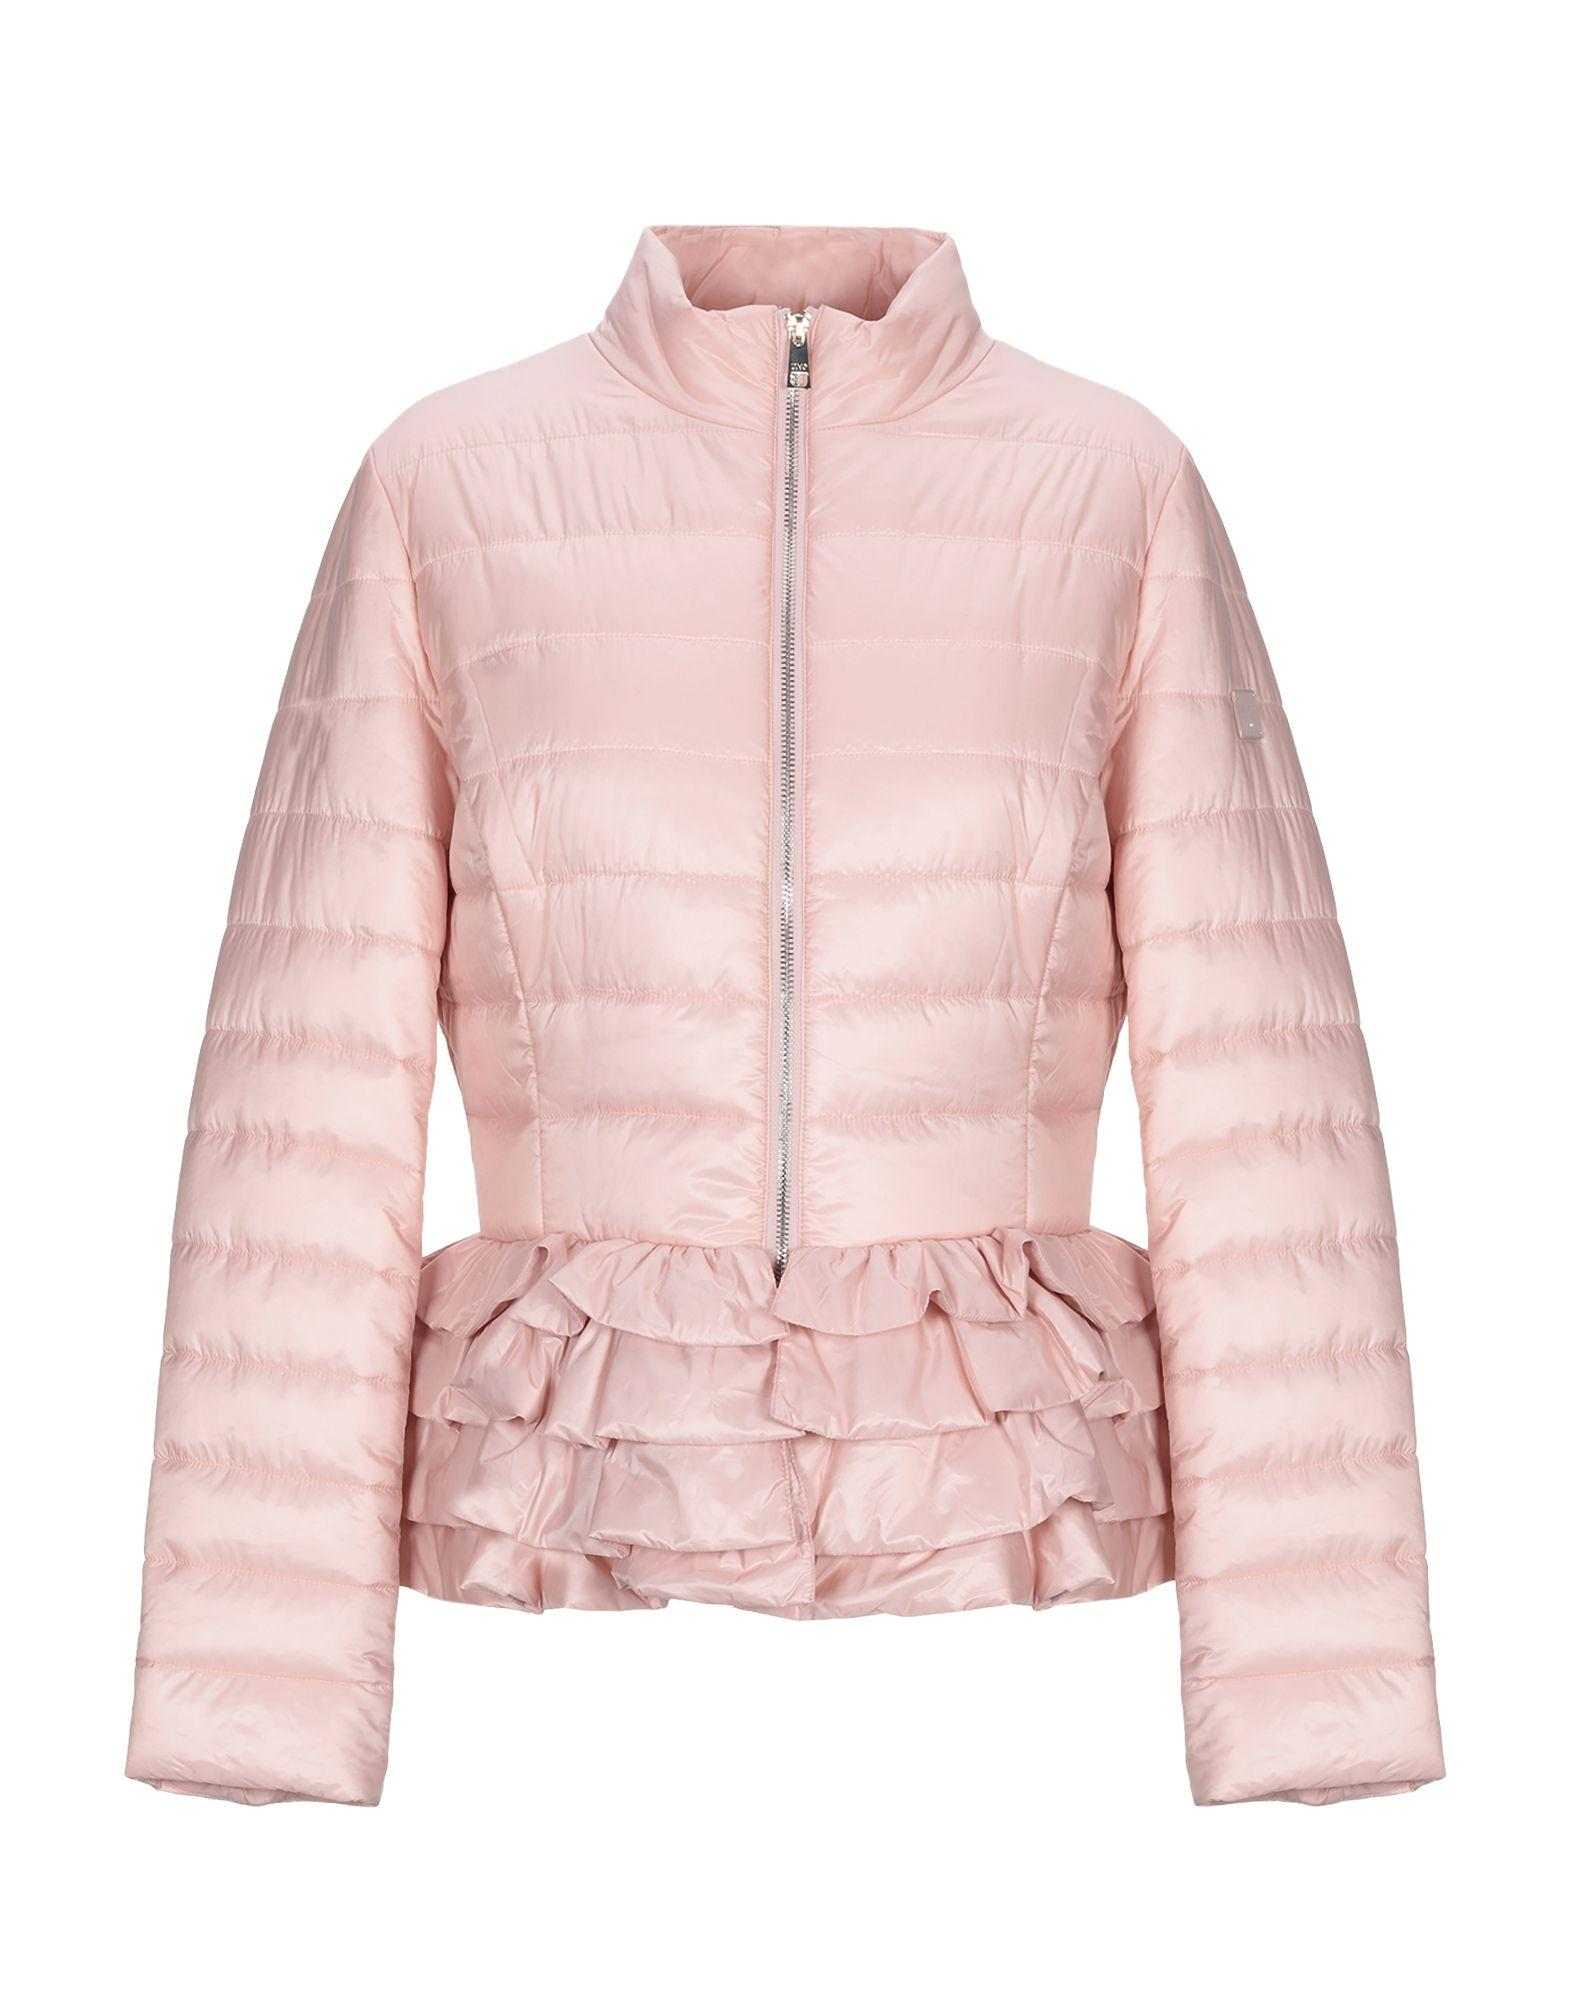 a126d6f153 Liu Jo Synthetic Down Jacket in Pink - Lyst